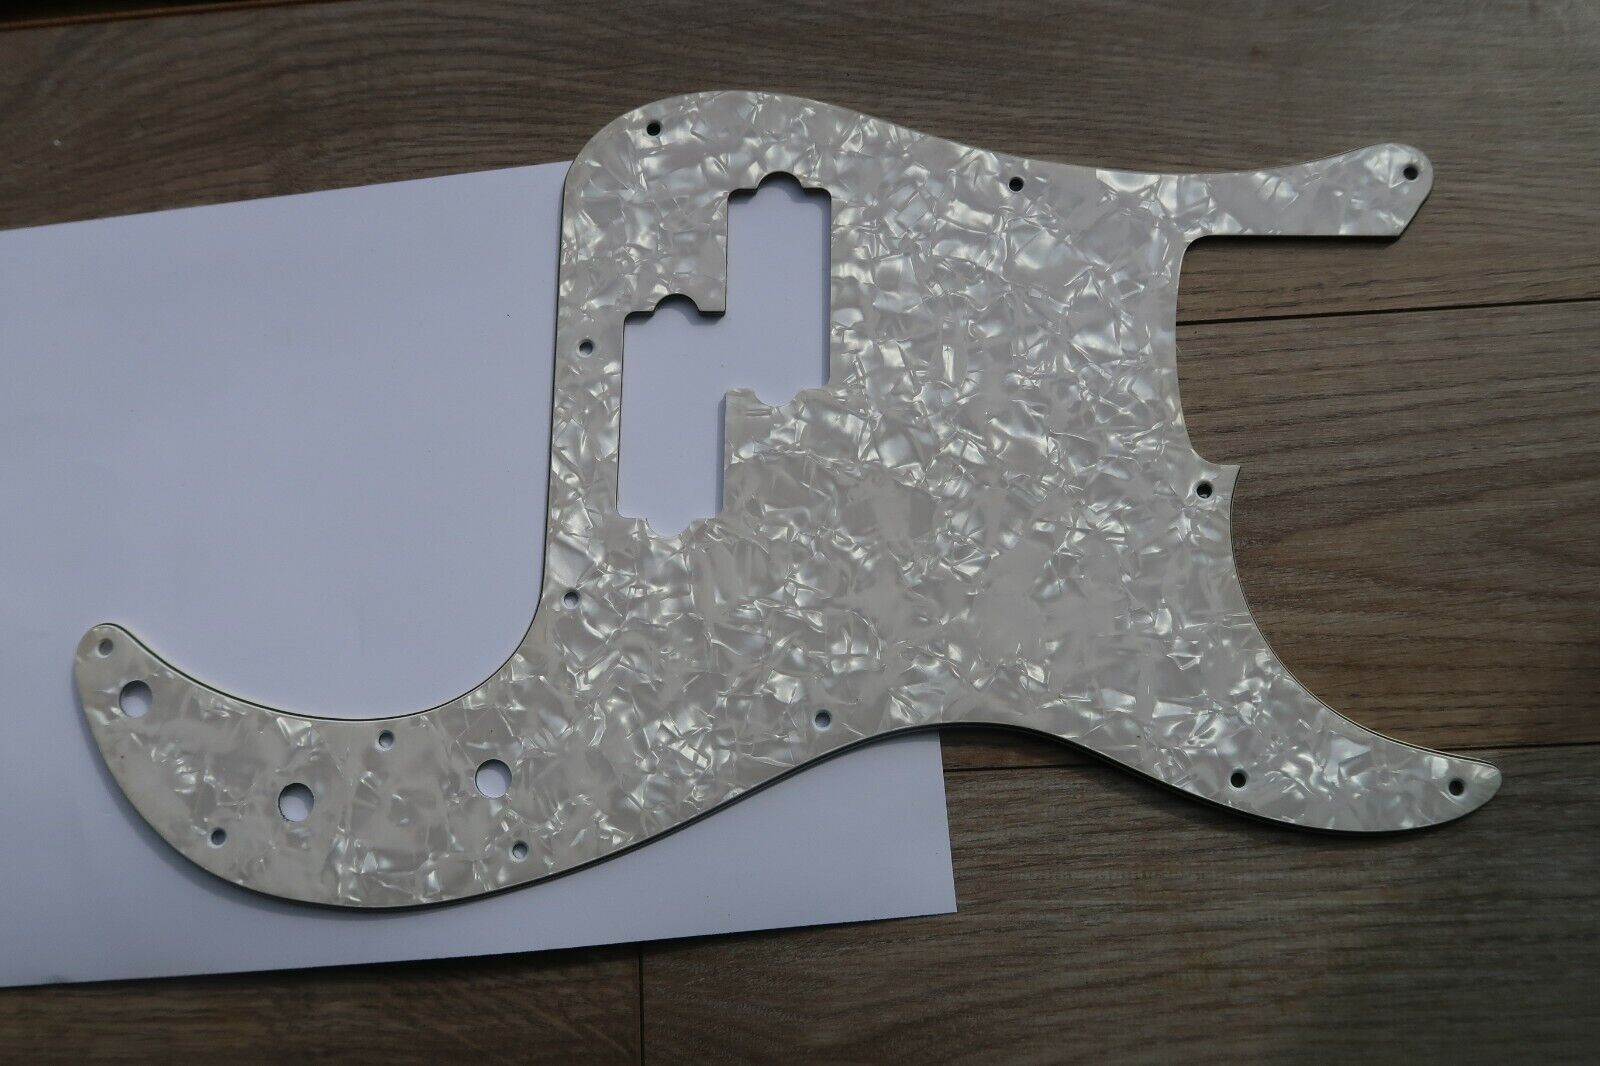 Squire Vintage Vibe Precision by Fender Precision Pearloid Pickguard Guard